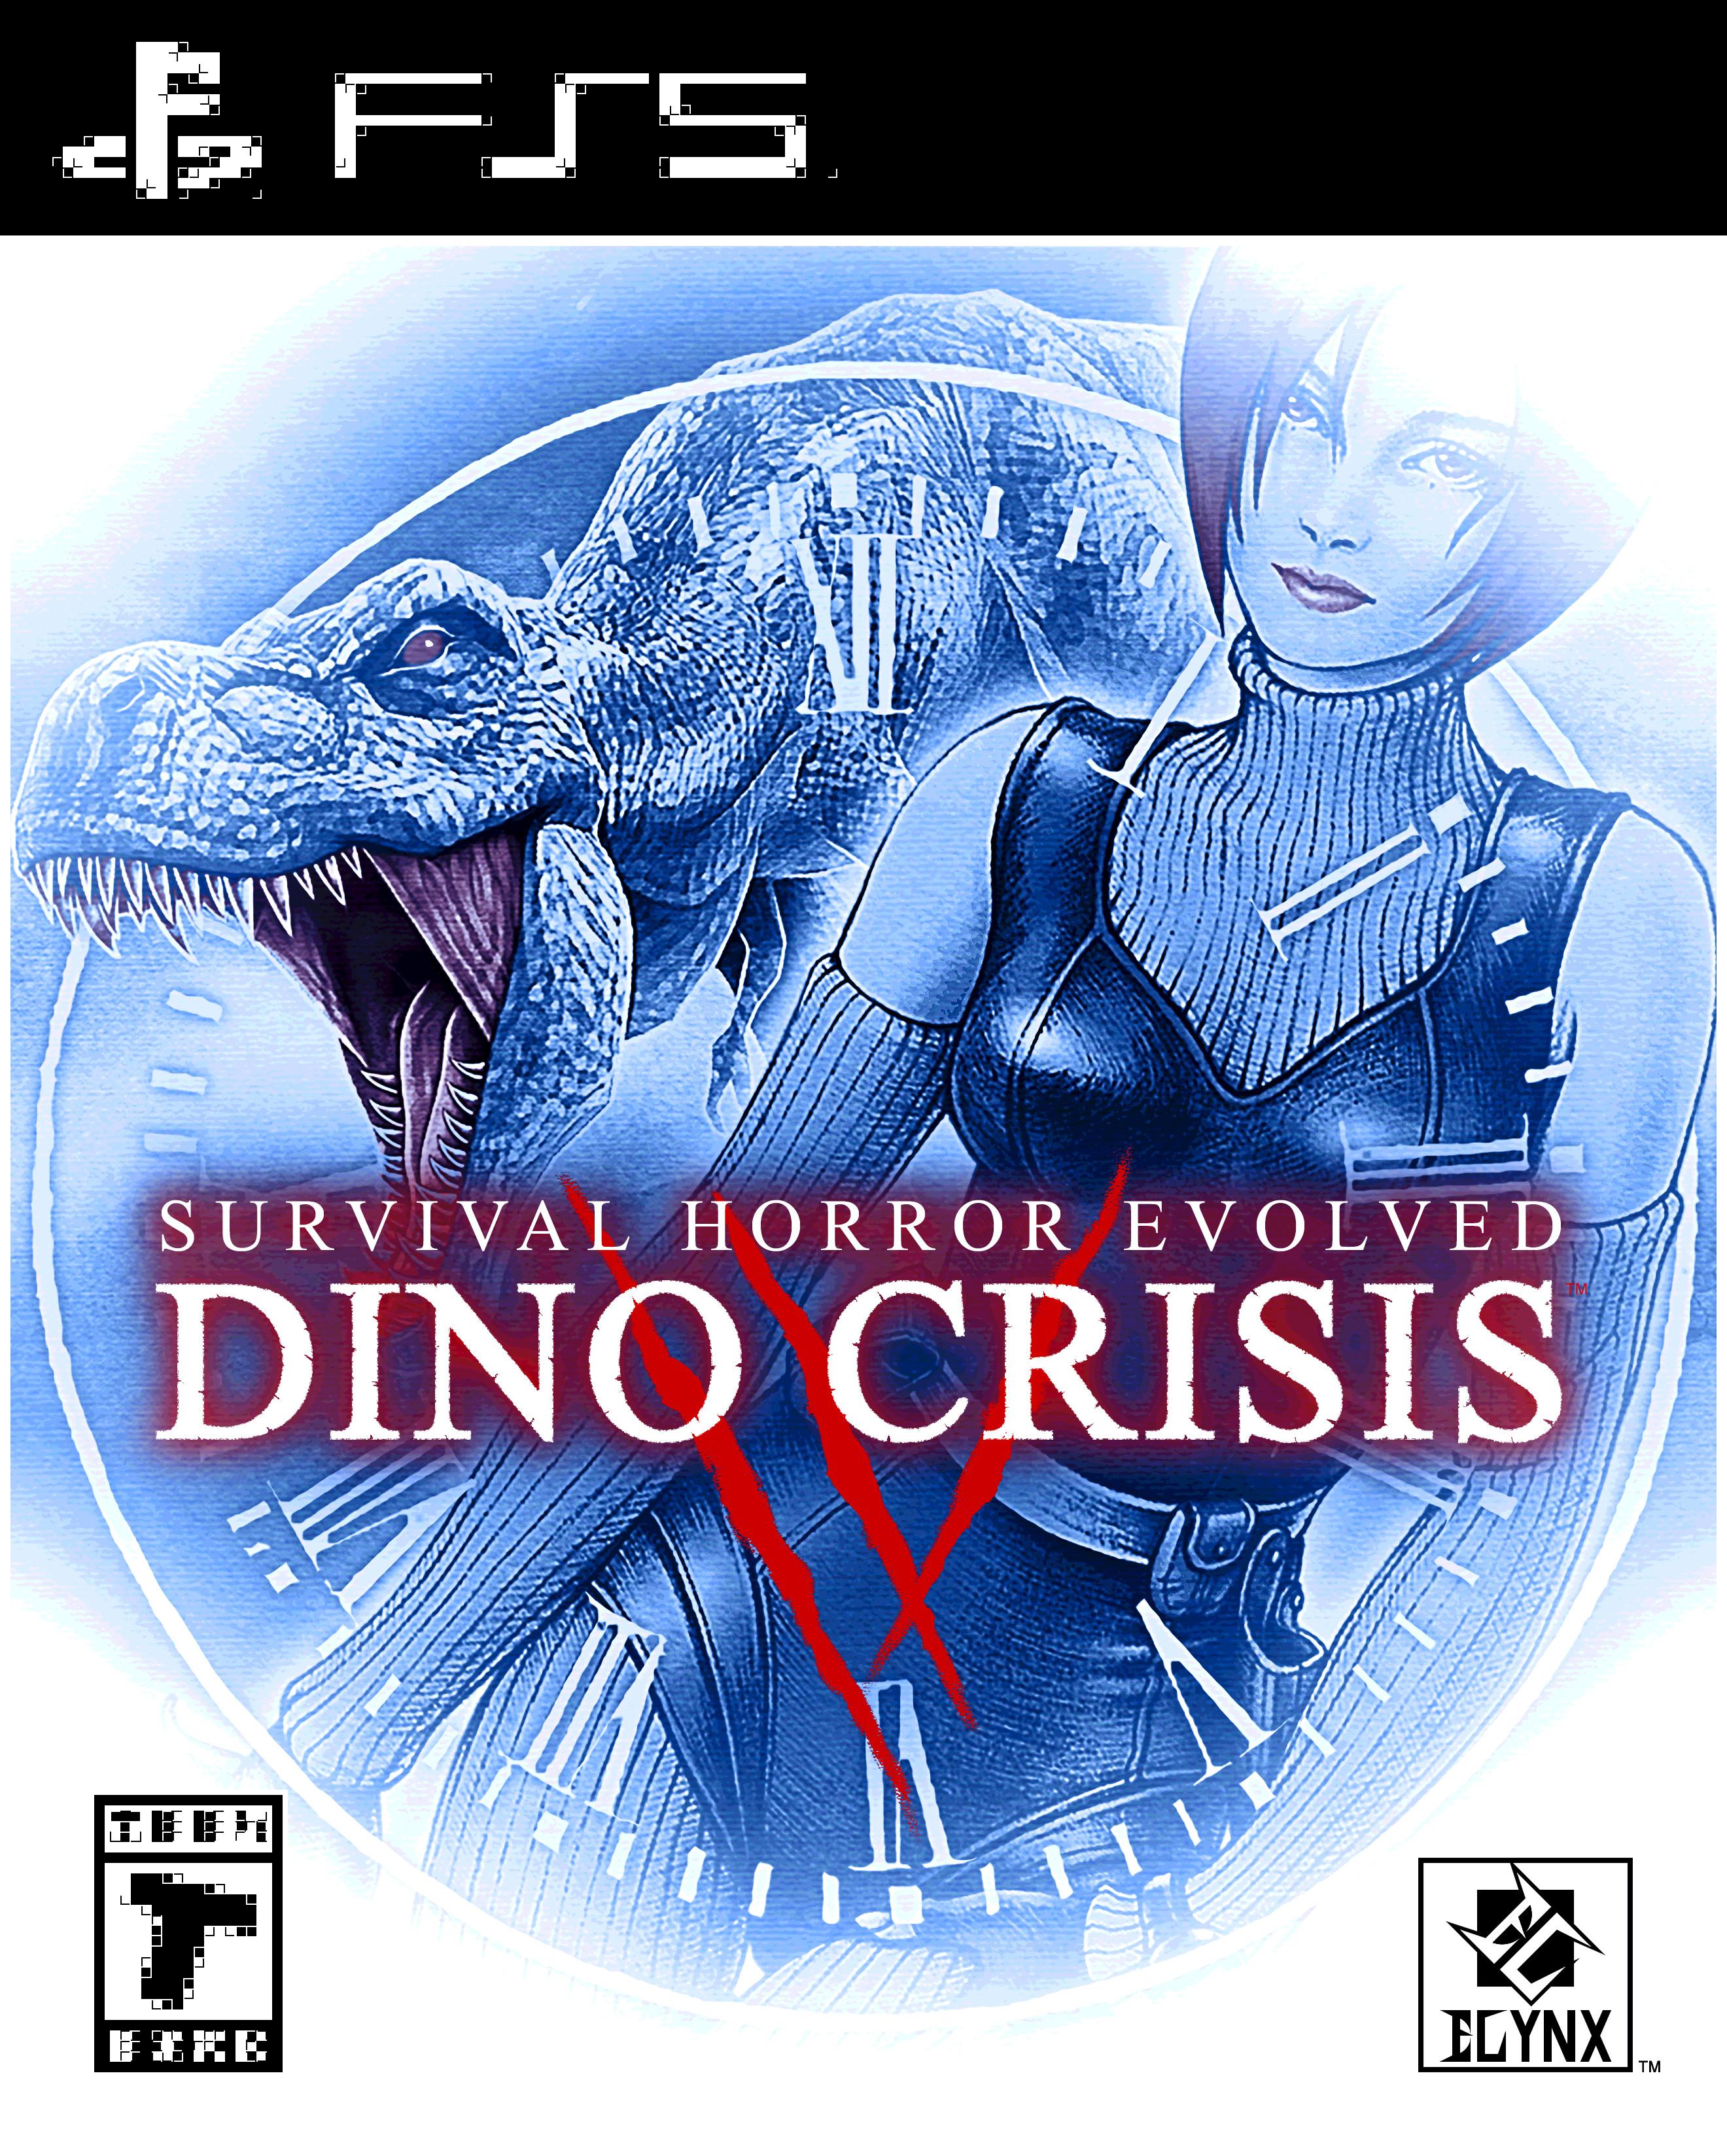 Dino Crisis IV - Box Art Design II